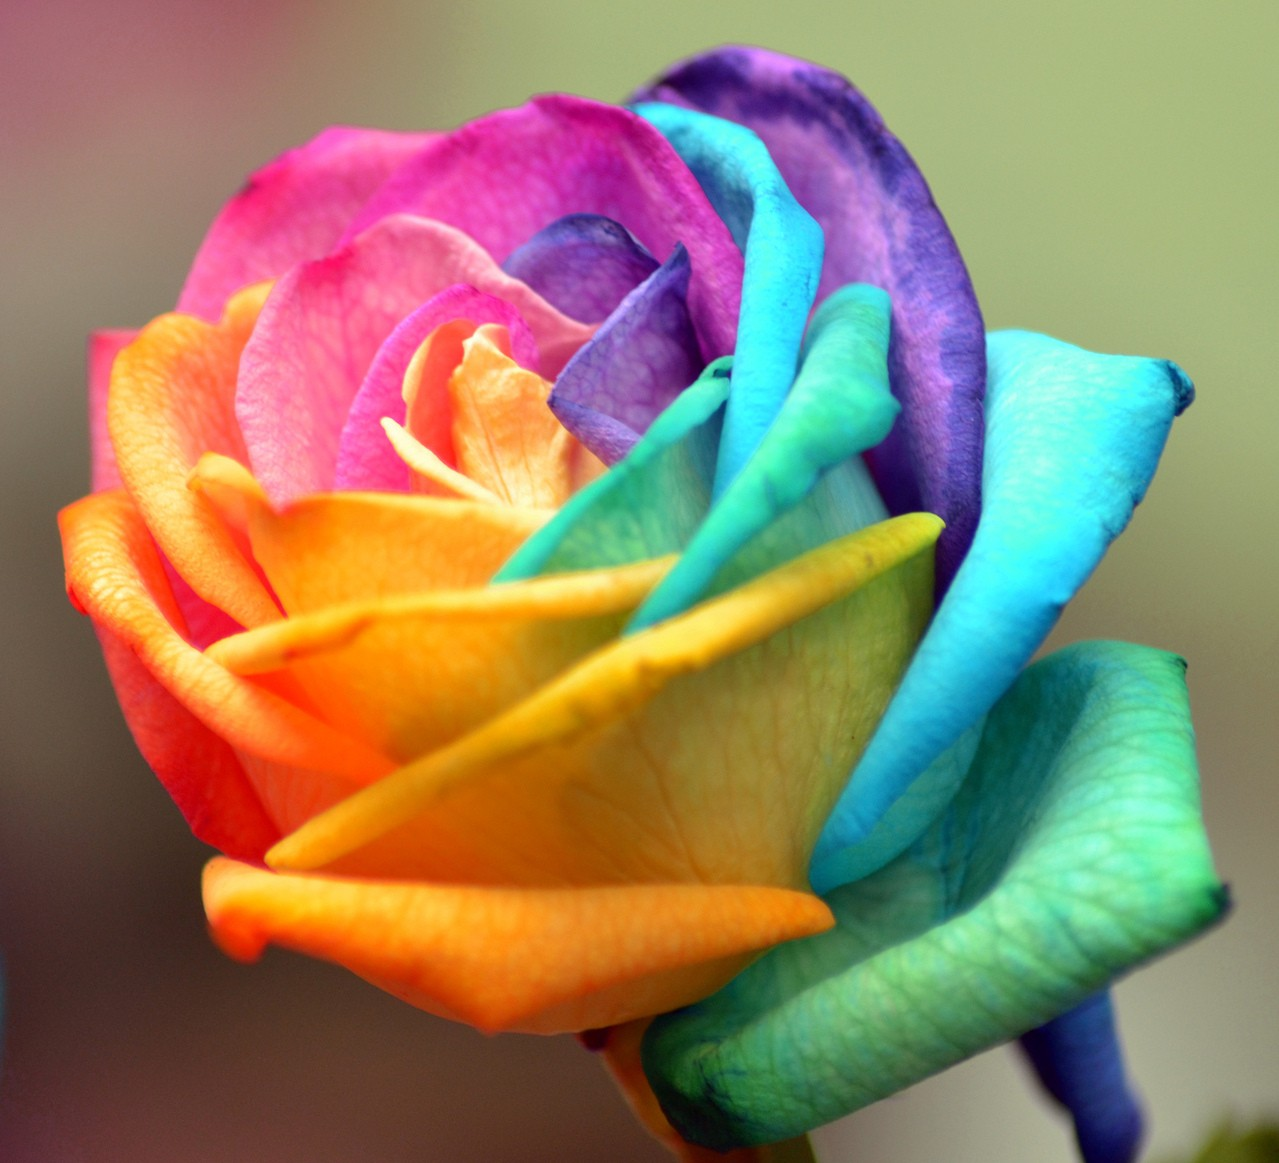 Ogród pełen róż